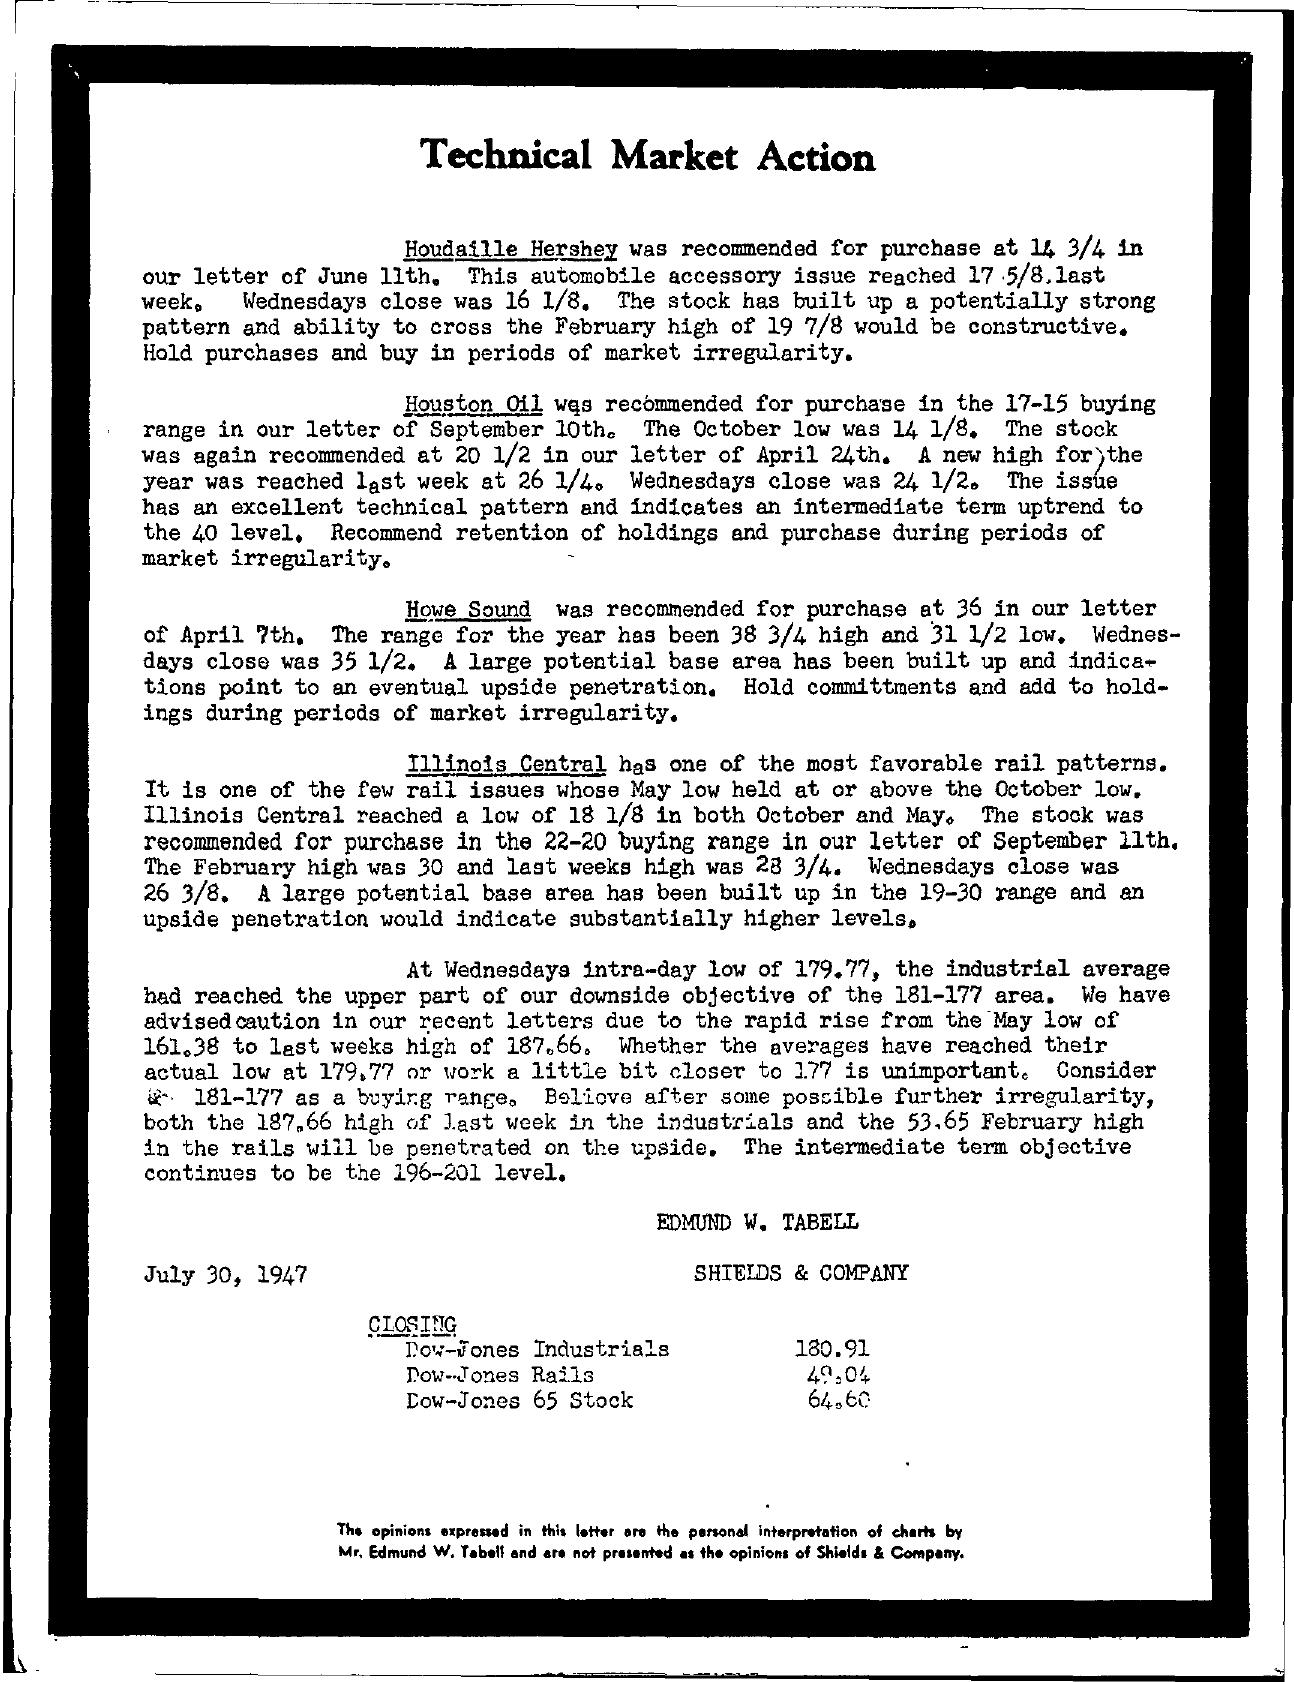 Tabell's Market Letter - July 30, 1947